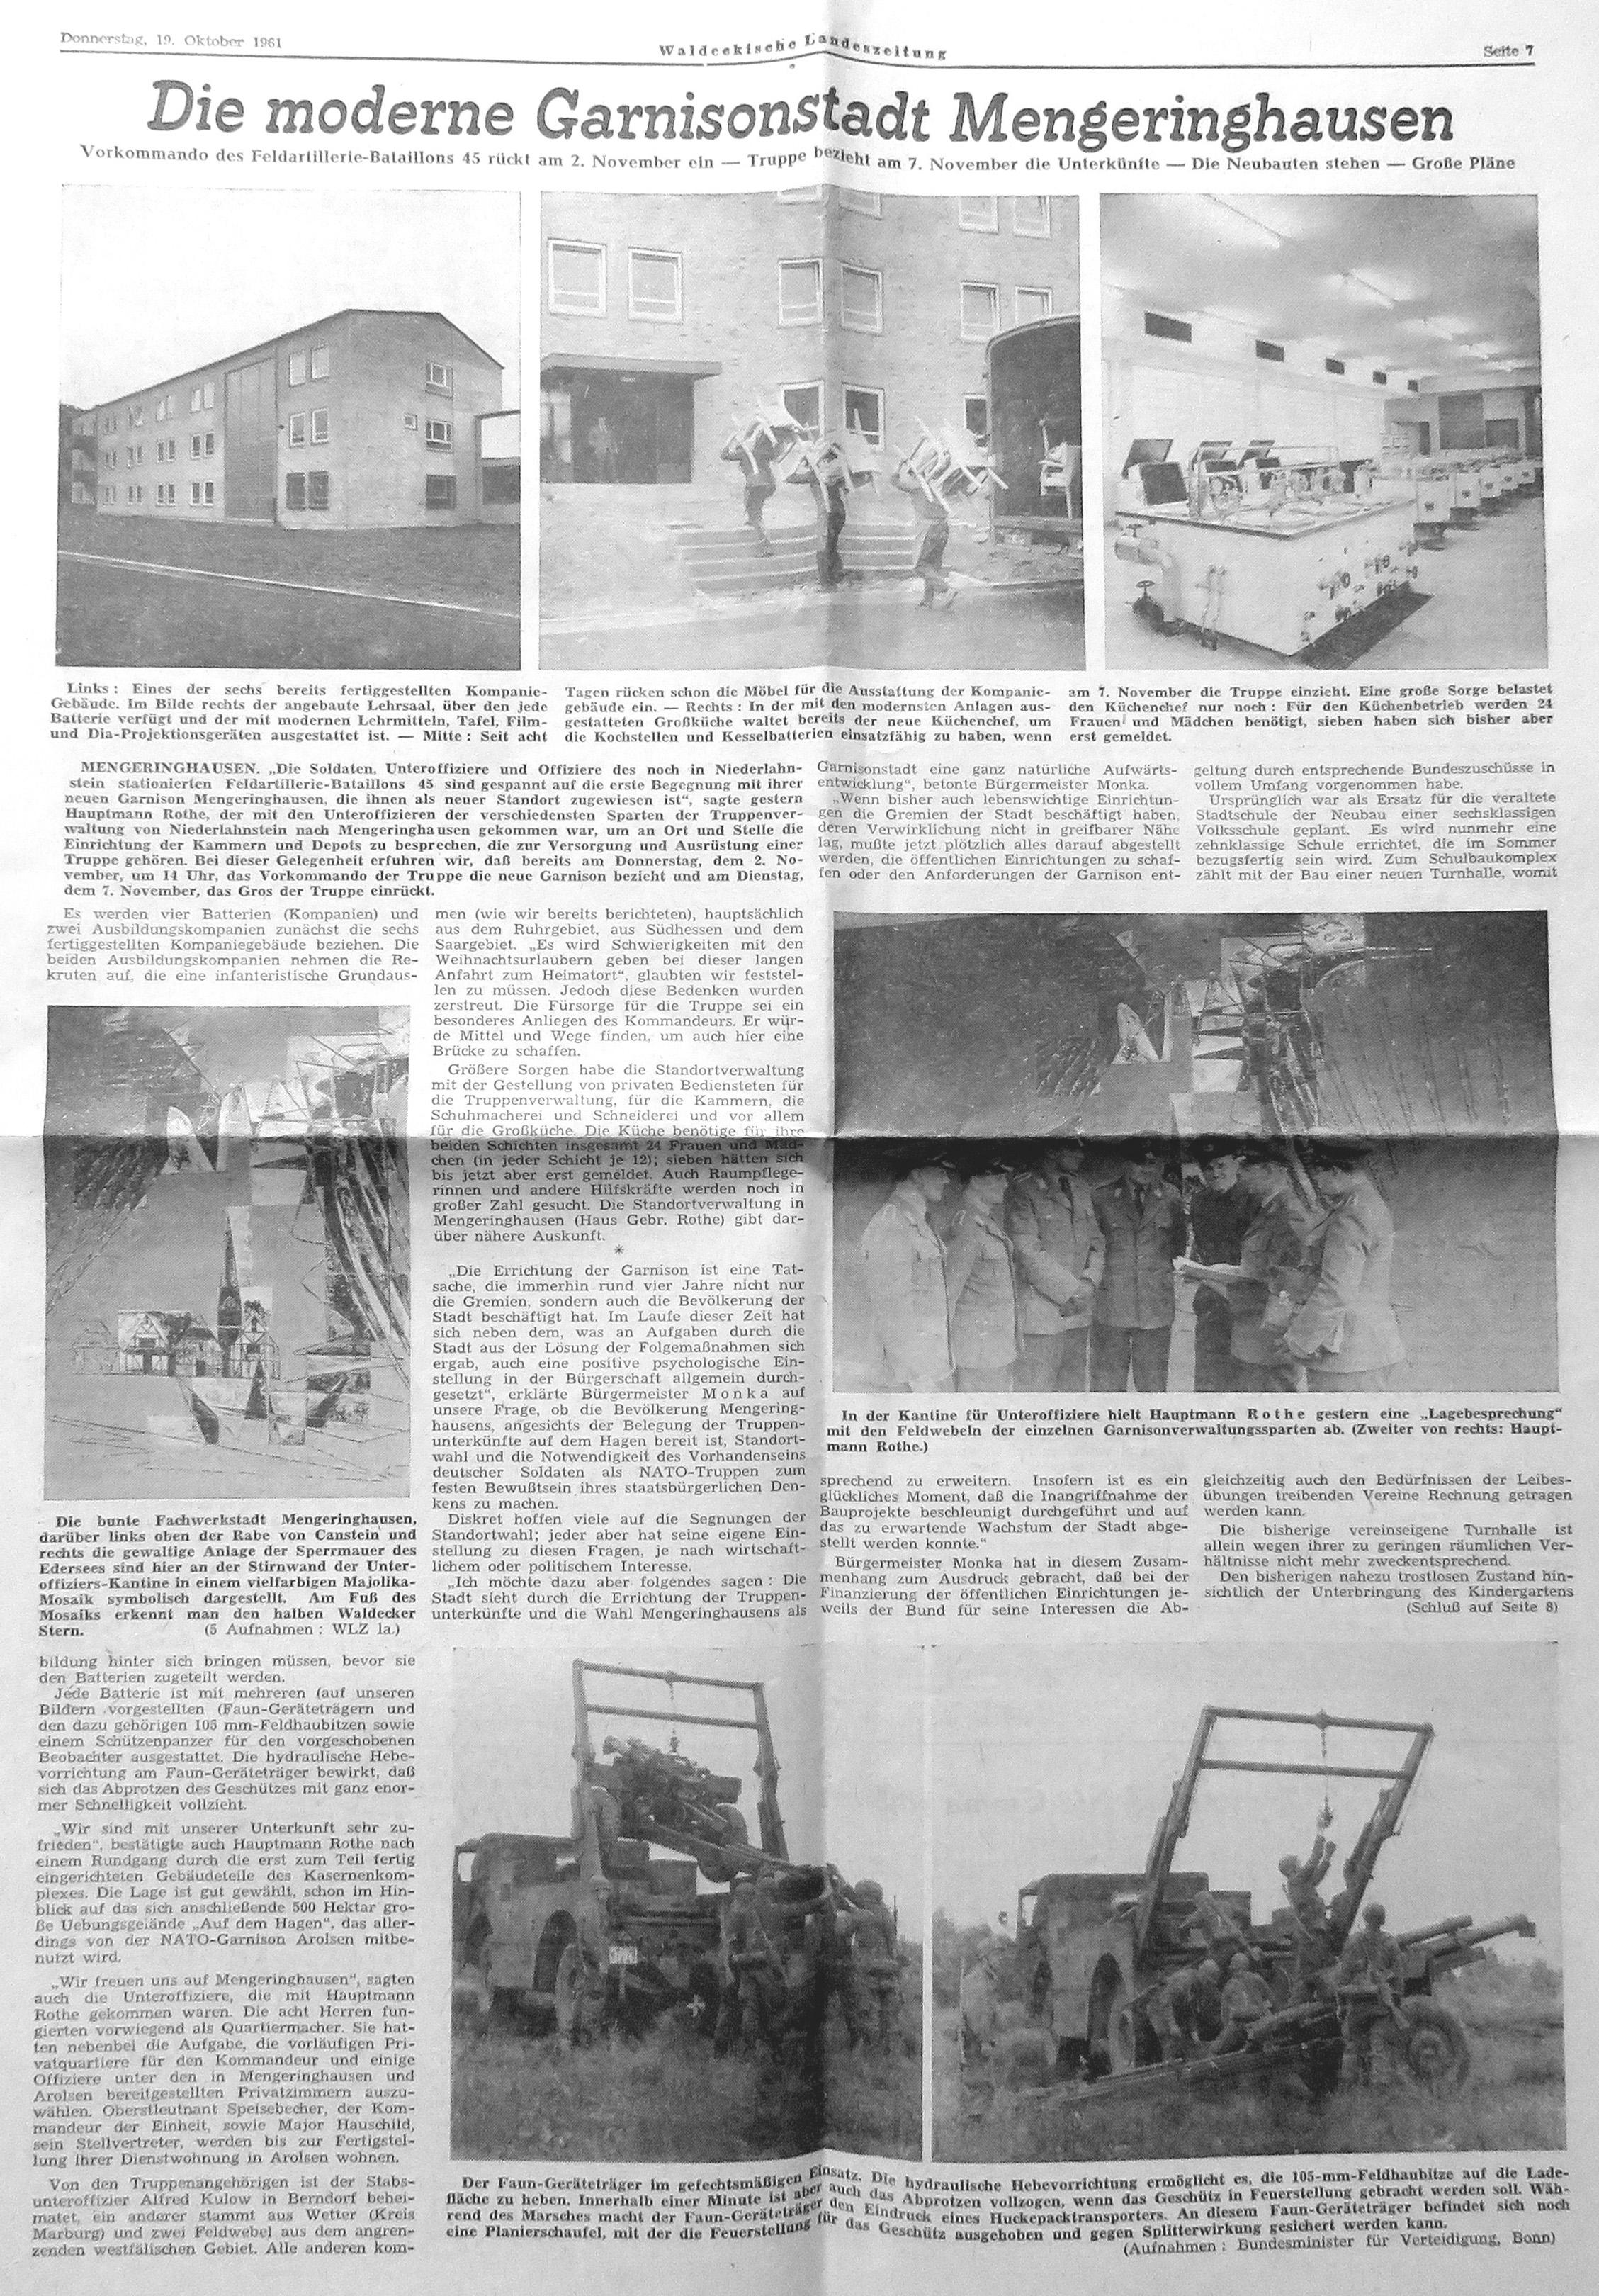 kas mengeringhsn presse 19.10.61